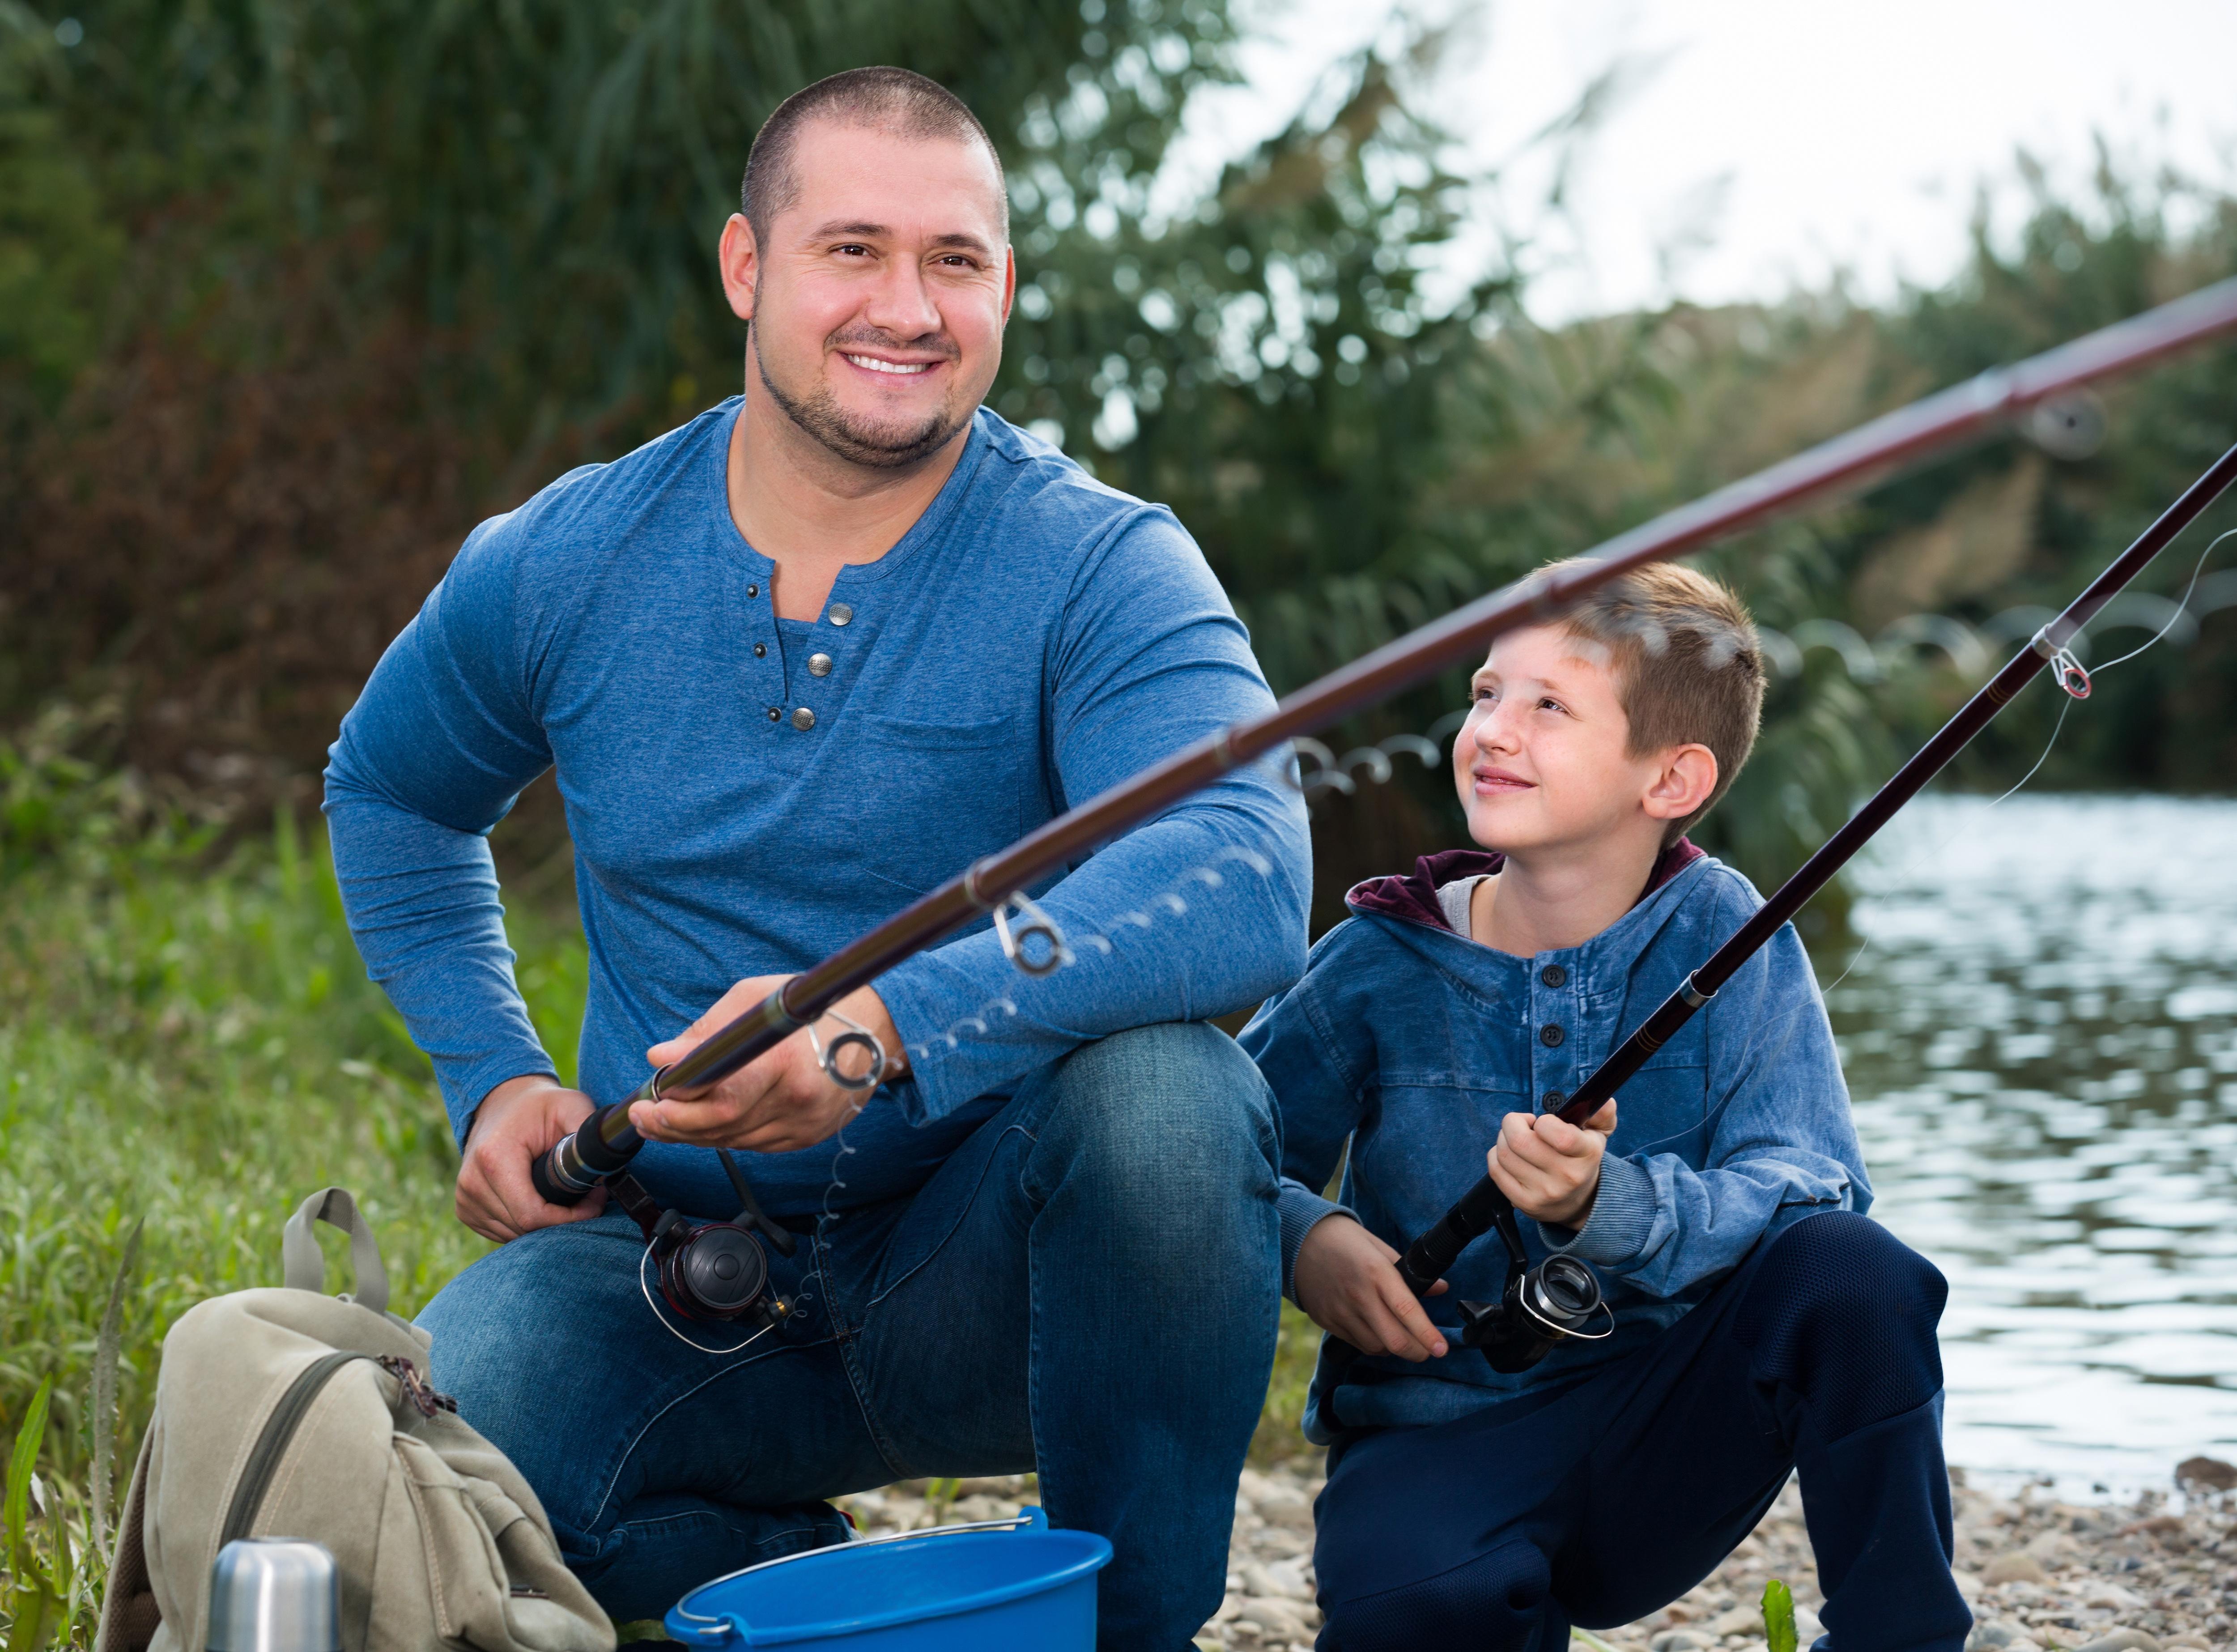 Family_Fun_Fishing_Father_Son_Oktoberfest_shutterstock_722712664